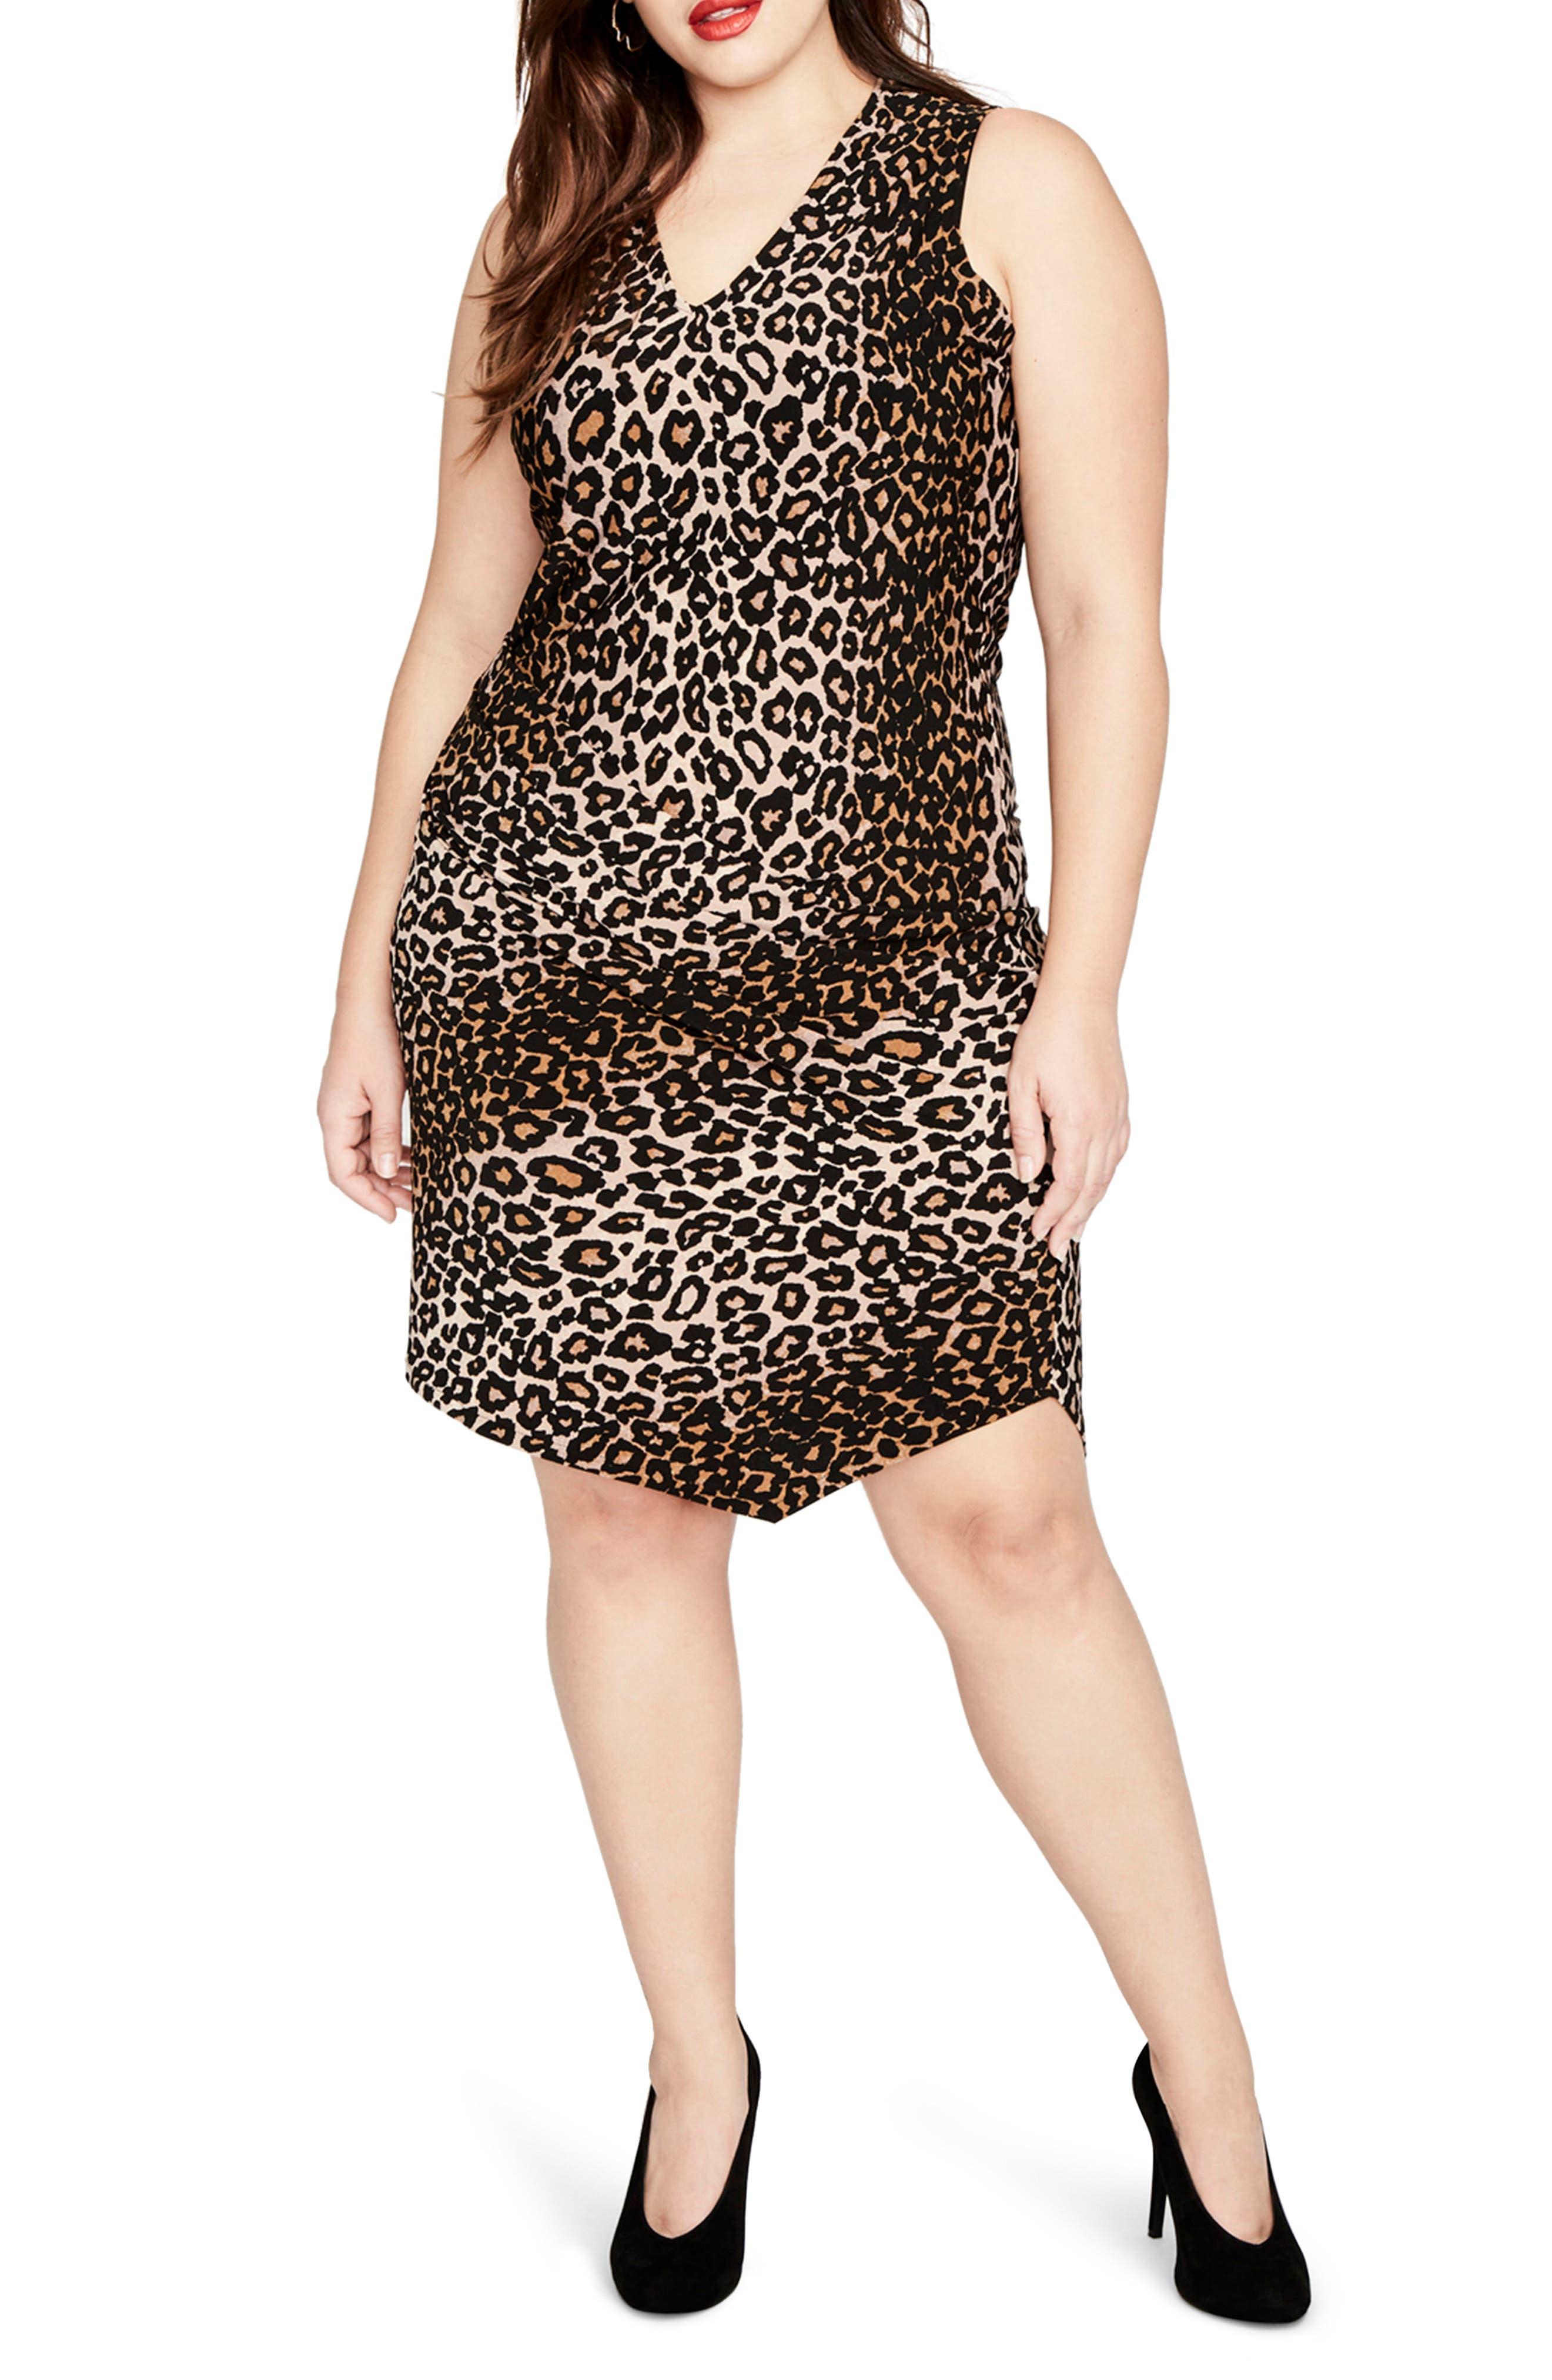 RACHEL BY Rachel Roy Leopard Print Asymmetrical Drape Dress,                         Main,                         color, 270